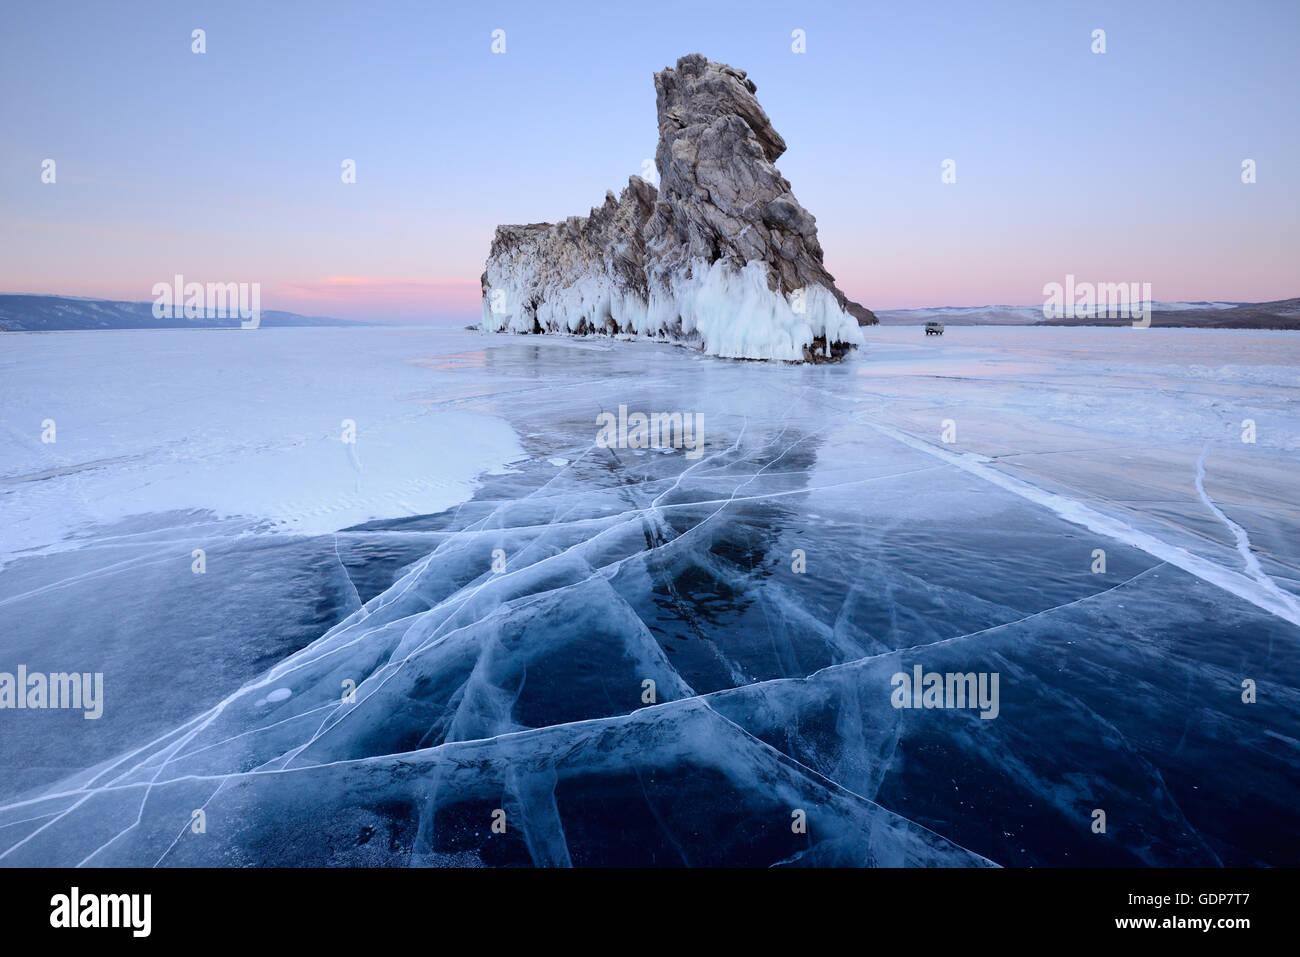 Ghiaccio e Ogoy Island, il lago Baikal, isola di Olkhon, Siberia, Russia Immagini Stock